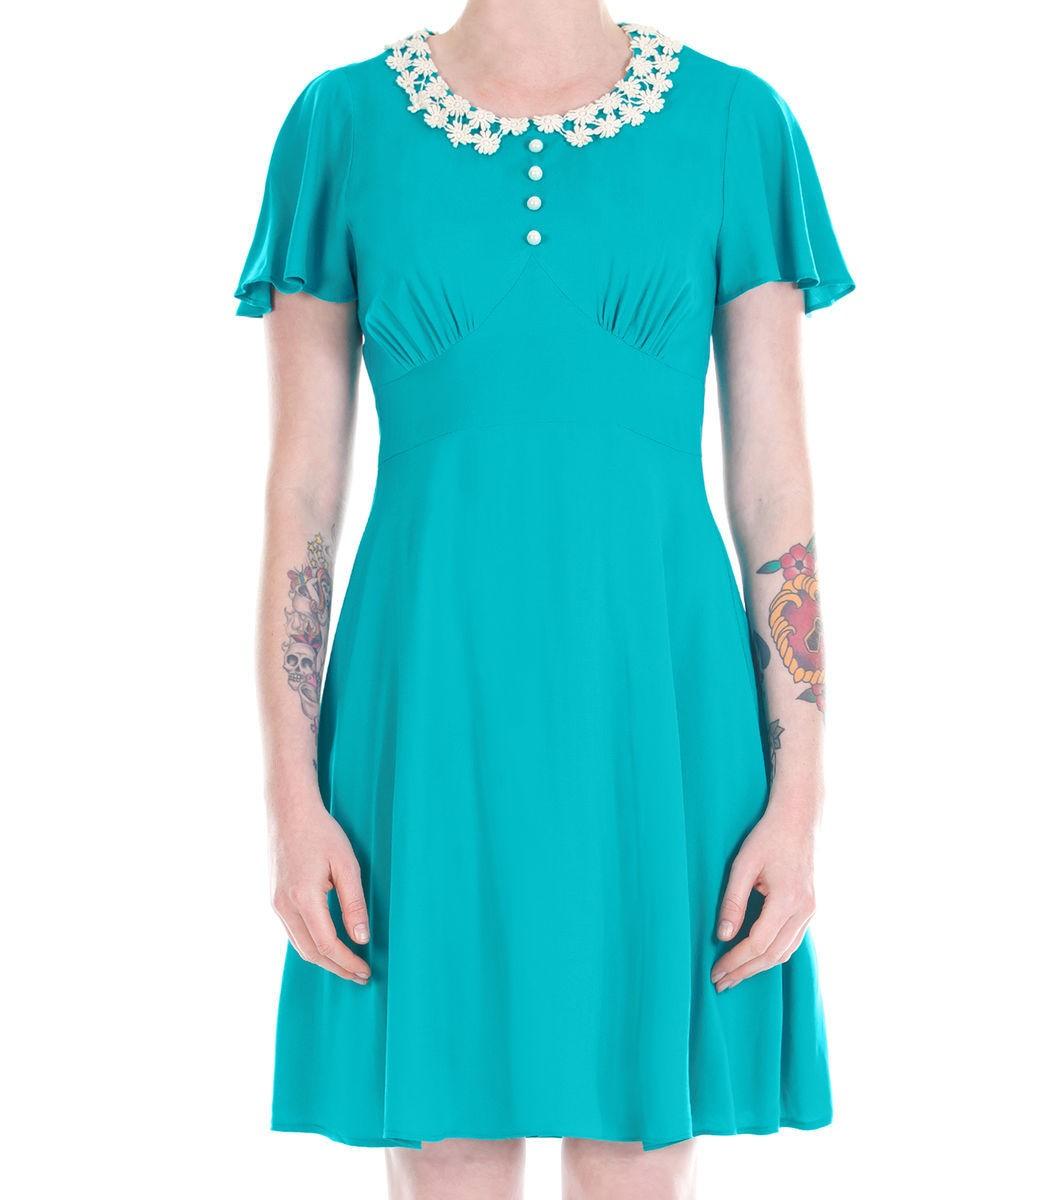 Everlyn Dress